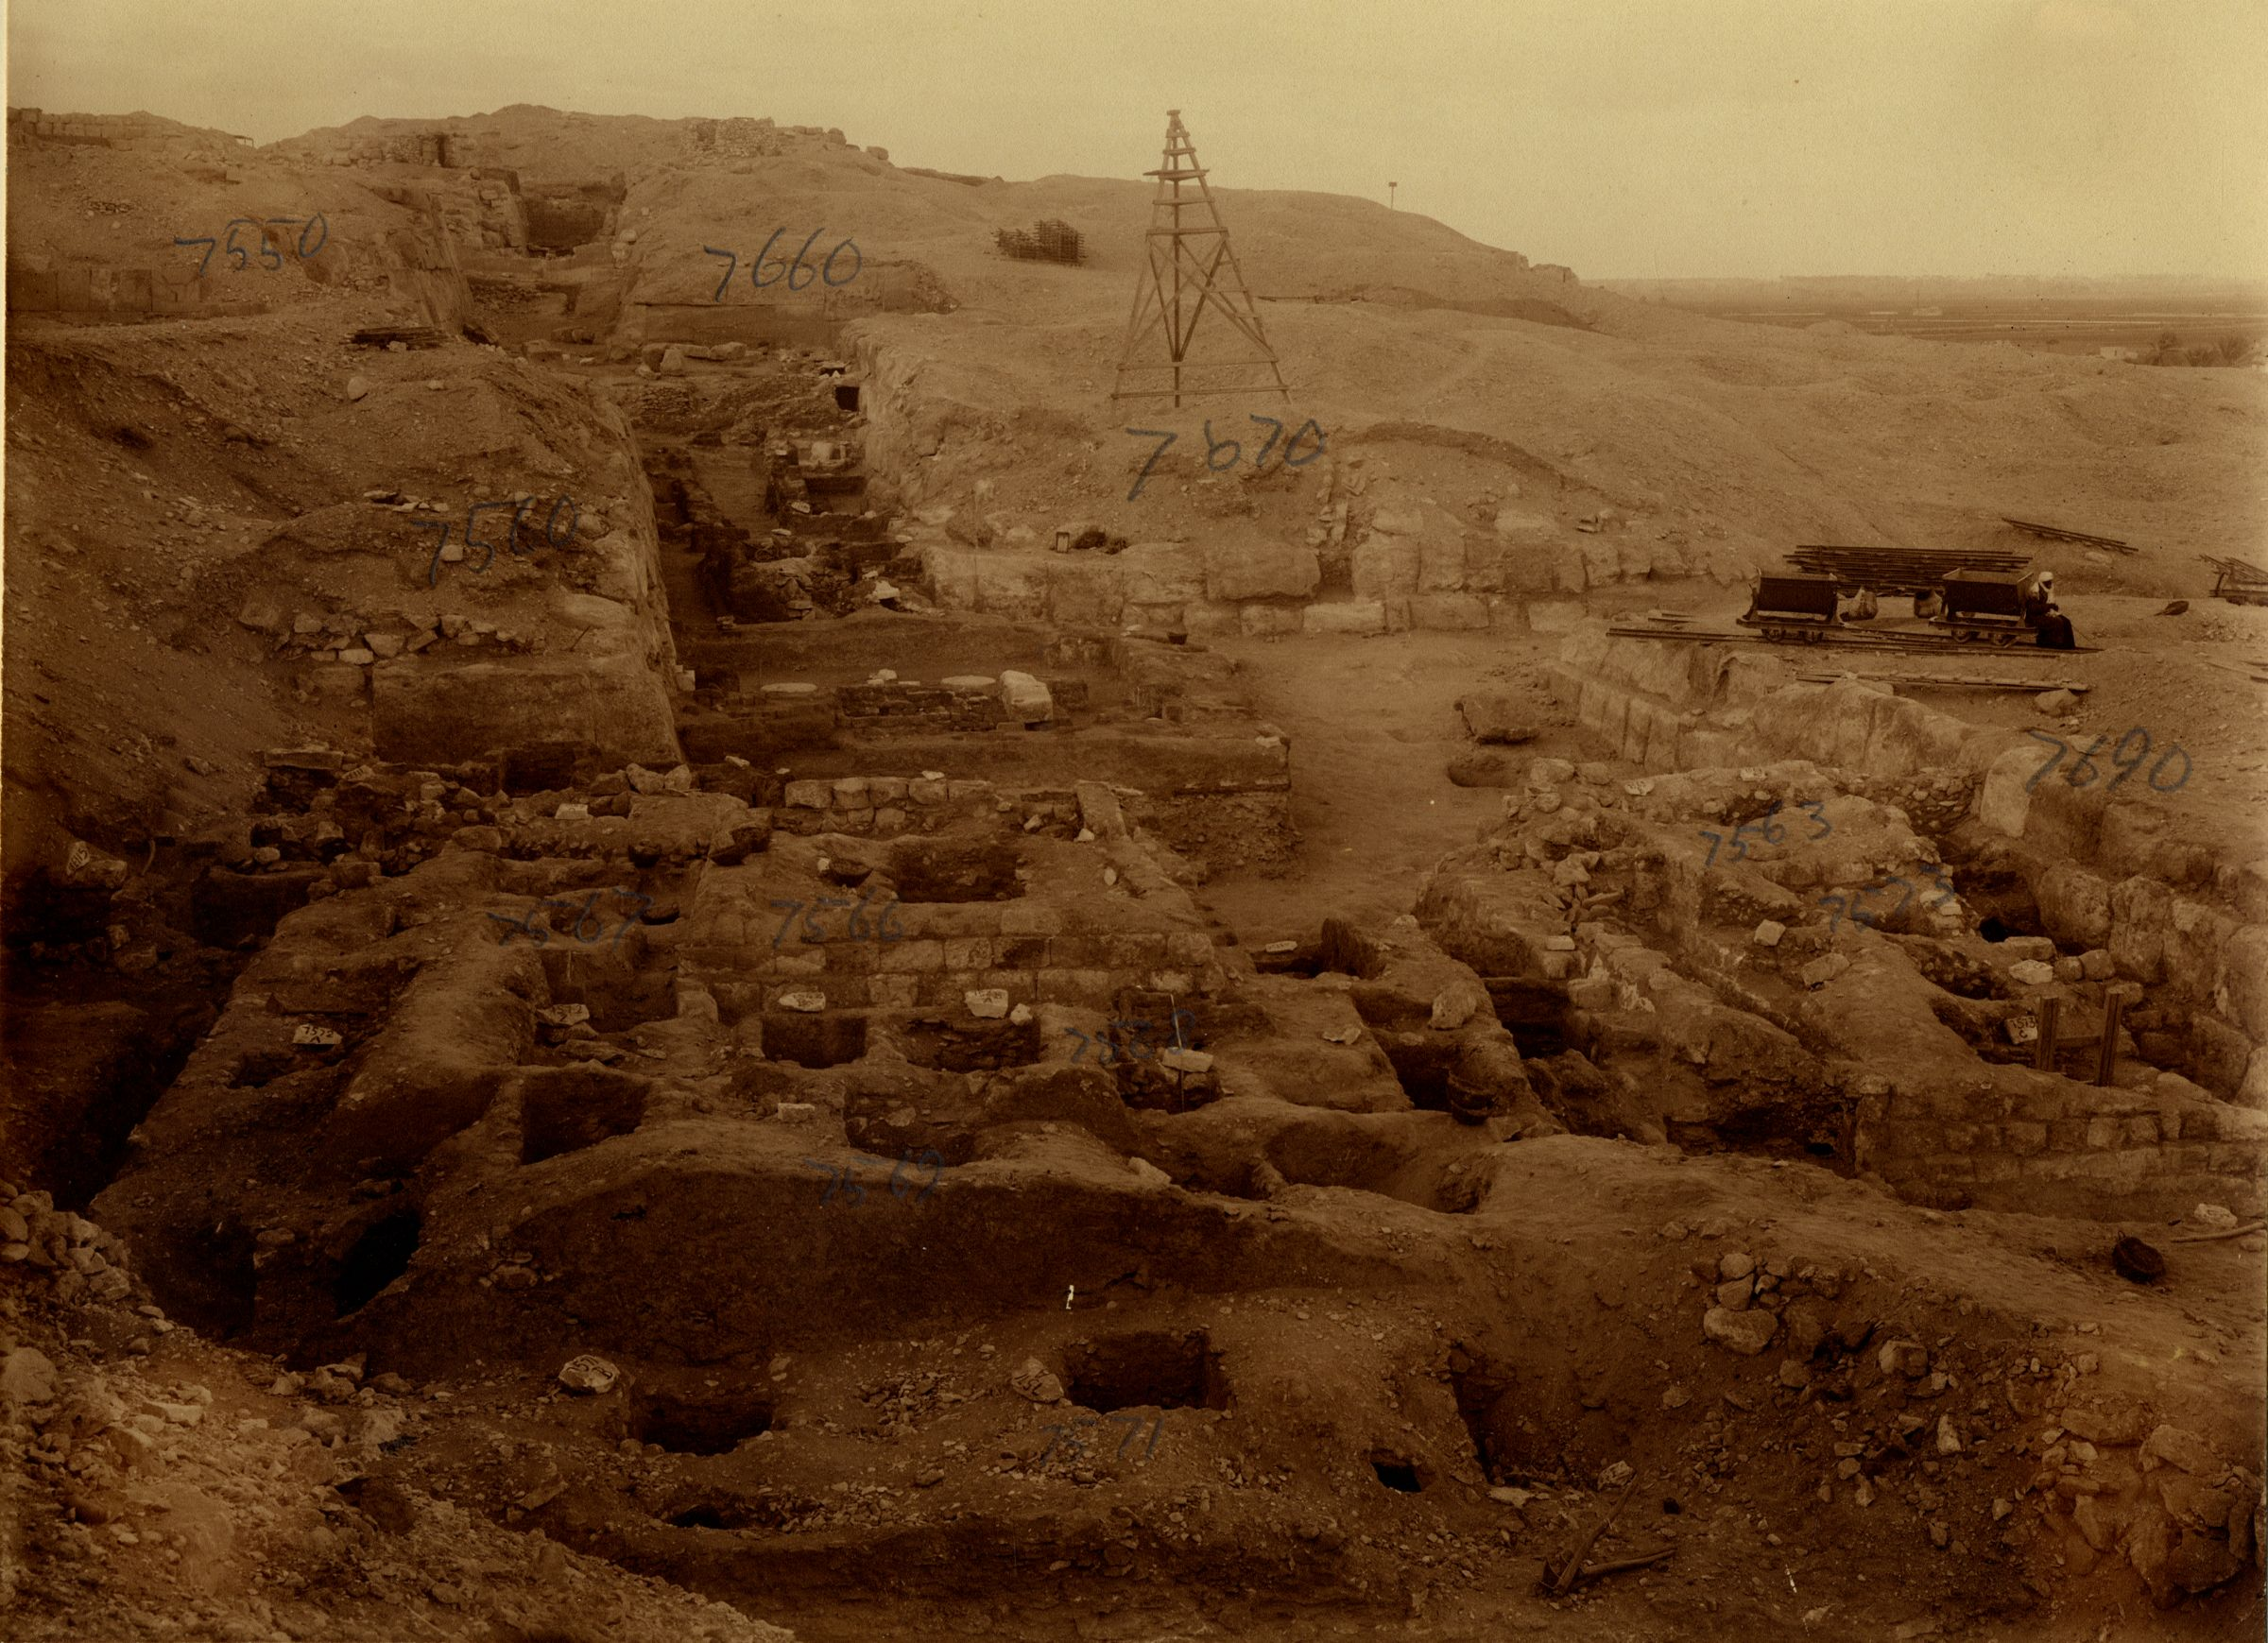 Eastern Cemetery: Site: Giza; View: G 7560, G 7690, G 7670, G 7563, G 7567, G 7566, G 7568, G 7569, G 7571, G 7573